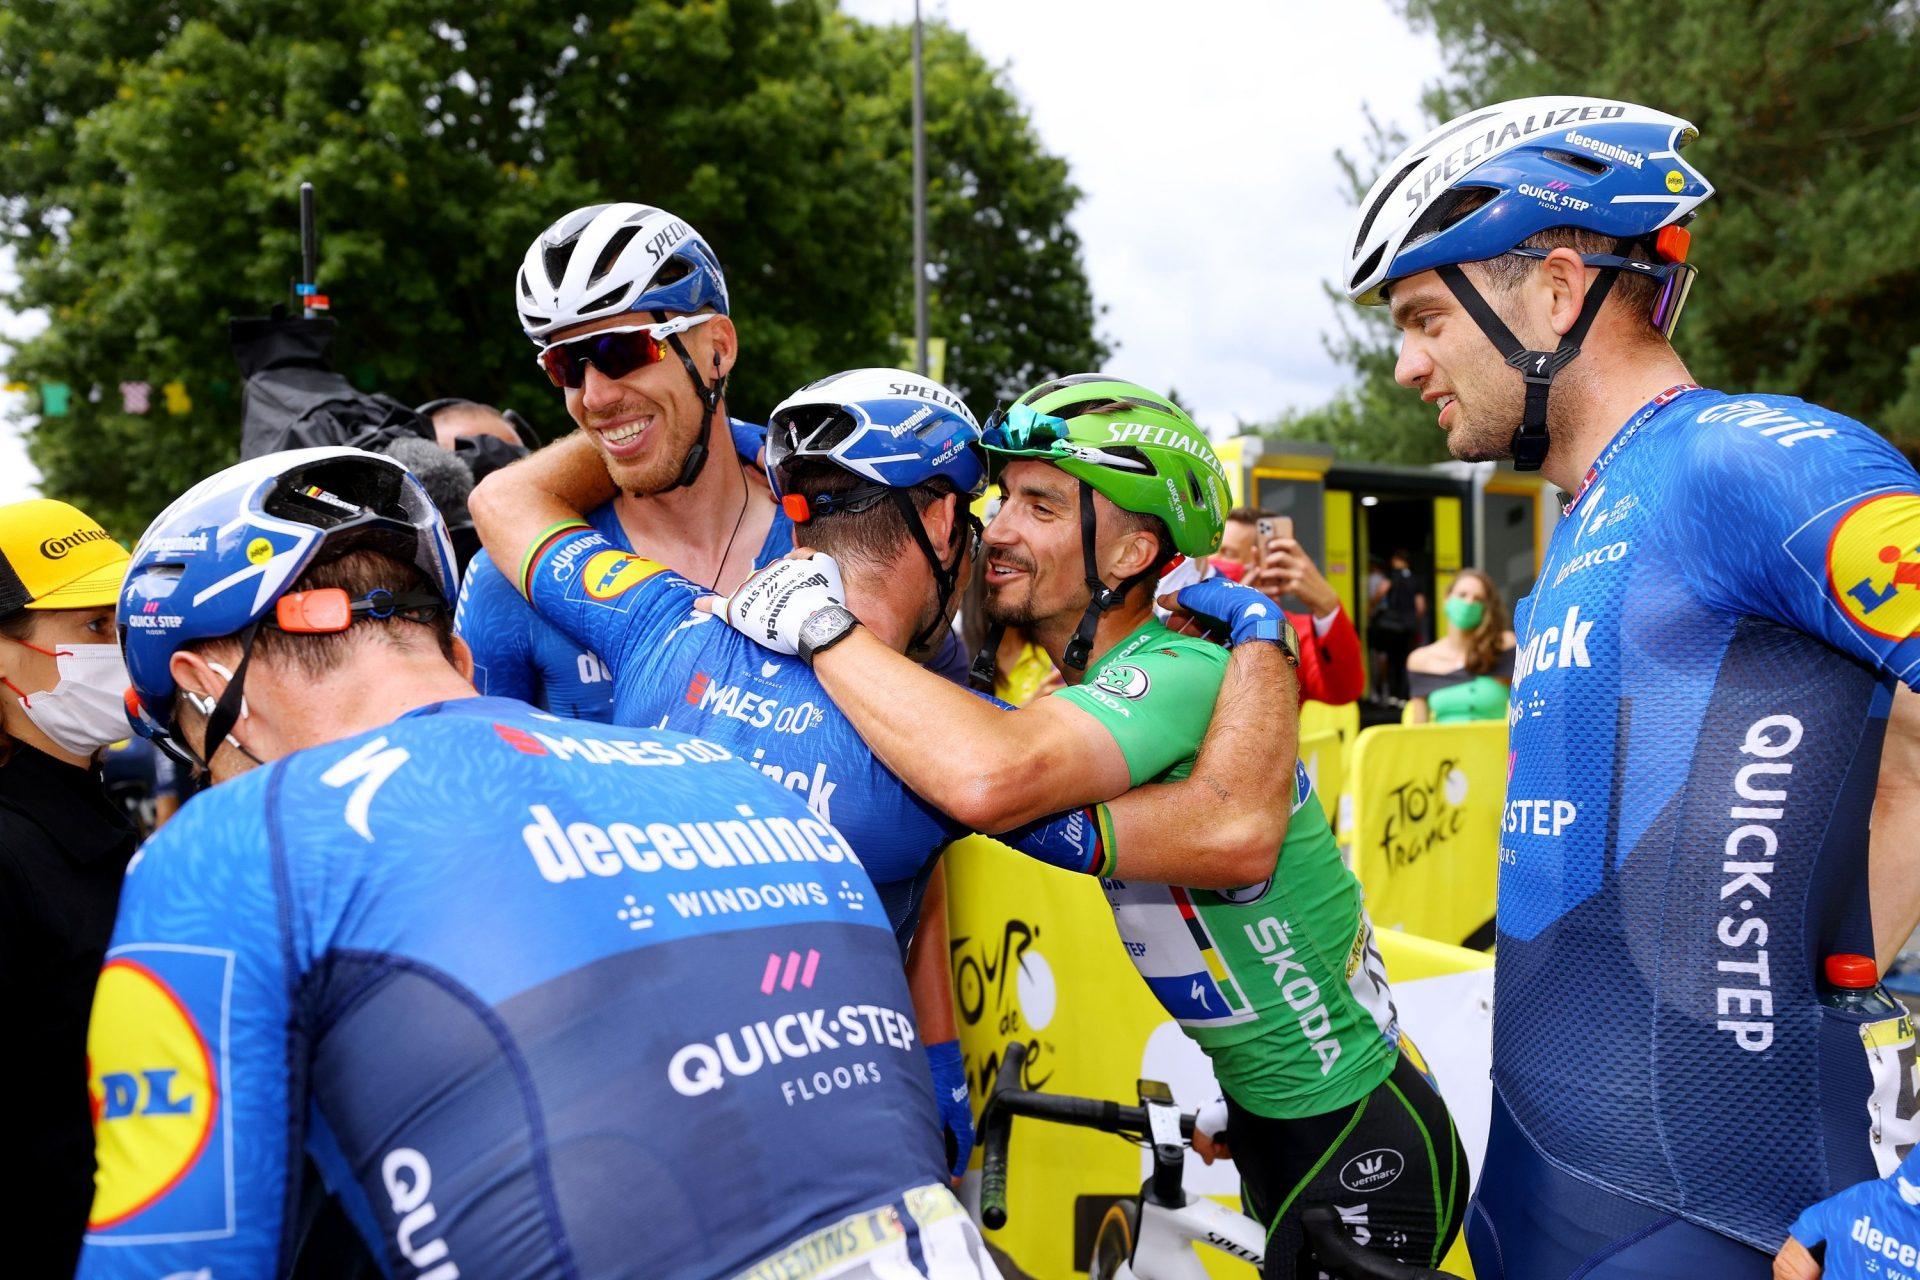 Mark Cavendish v obklopení šťastných parťáků z týmu Deceuninck Quick Step.